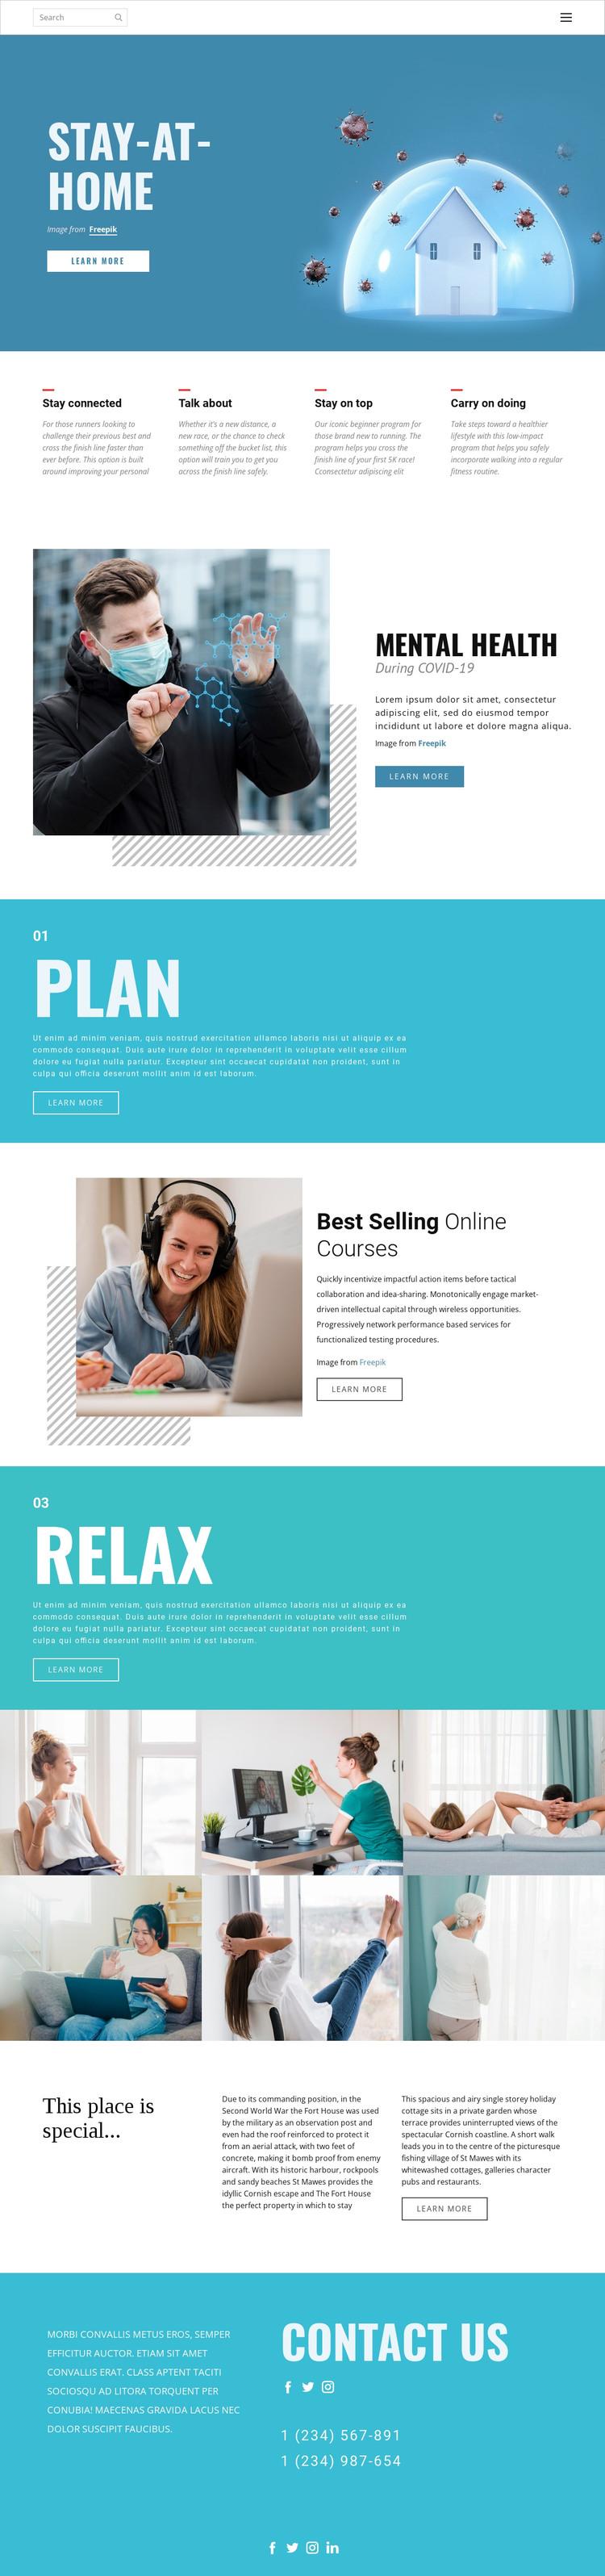 Stay-at-home medicine WordPress Theme